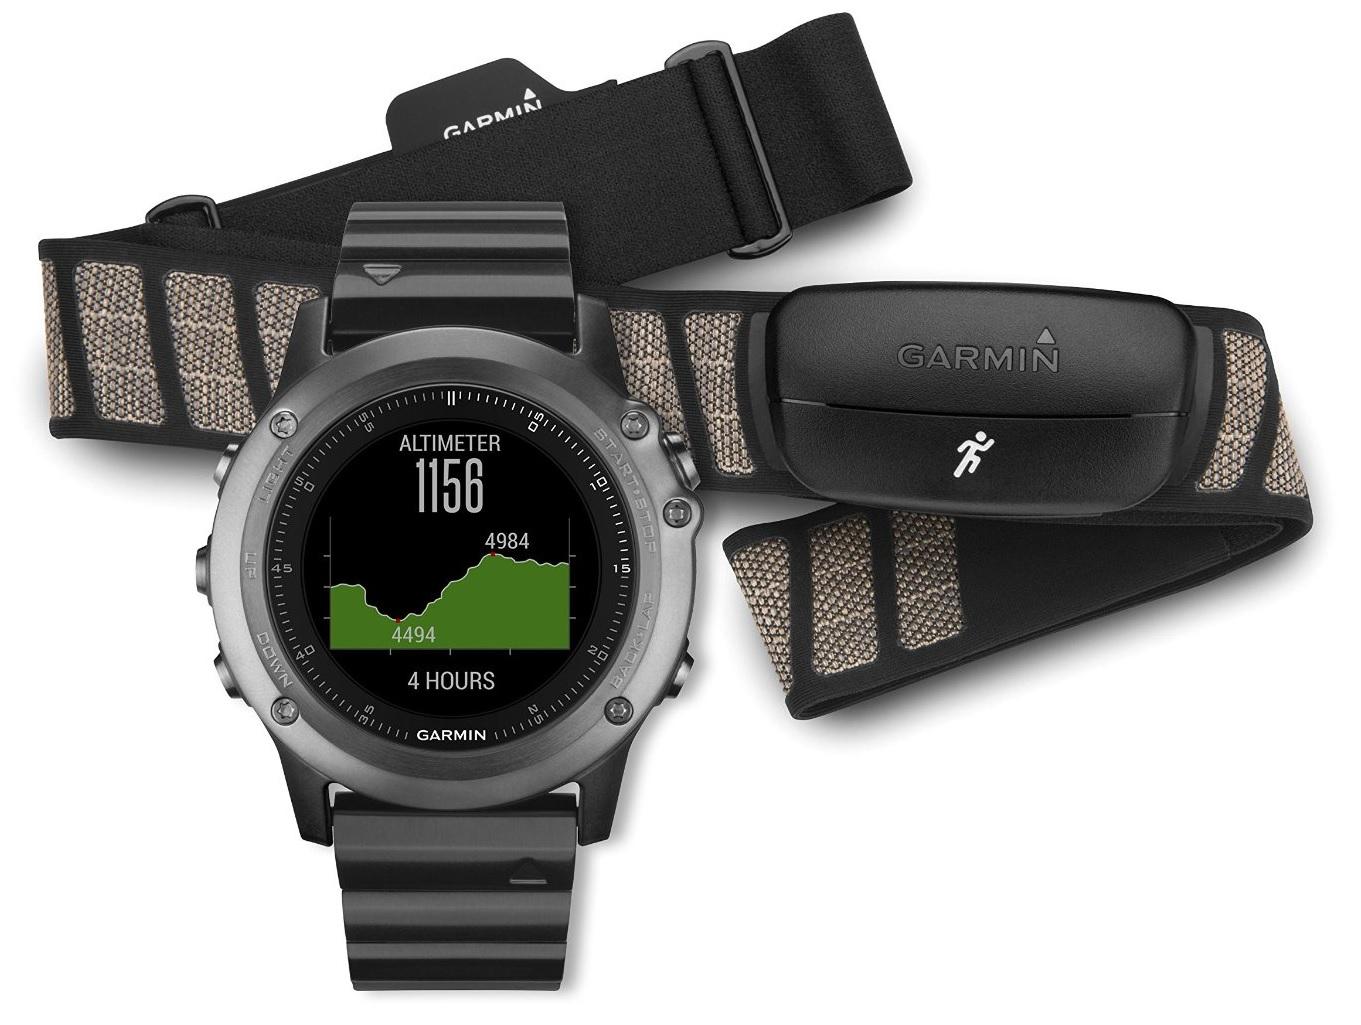 Garmin Fenix 3 Performer HRM (010-01338-26) - спортивные часы + нагрудный пульсометр (Sapphire)